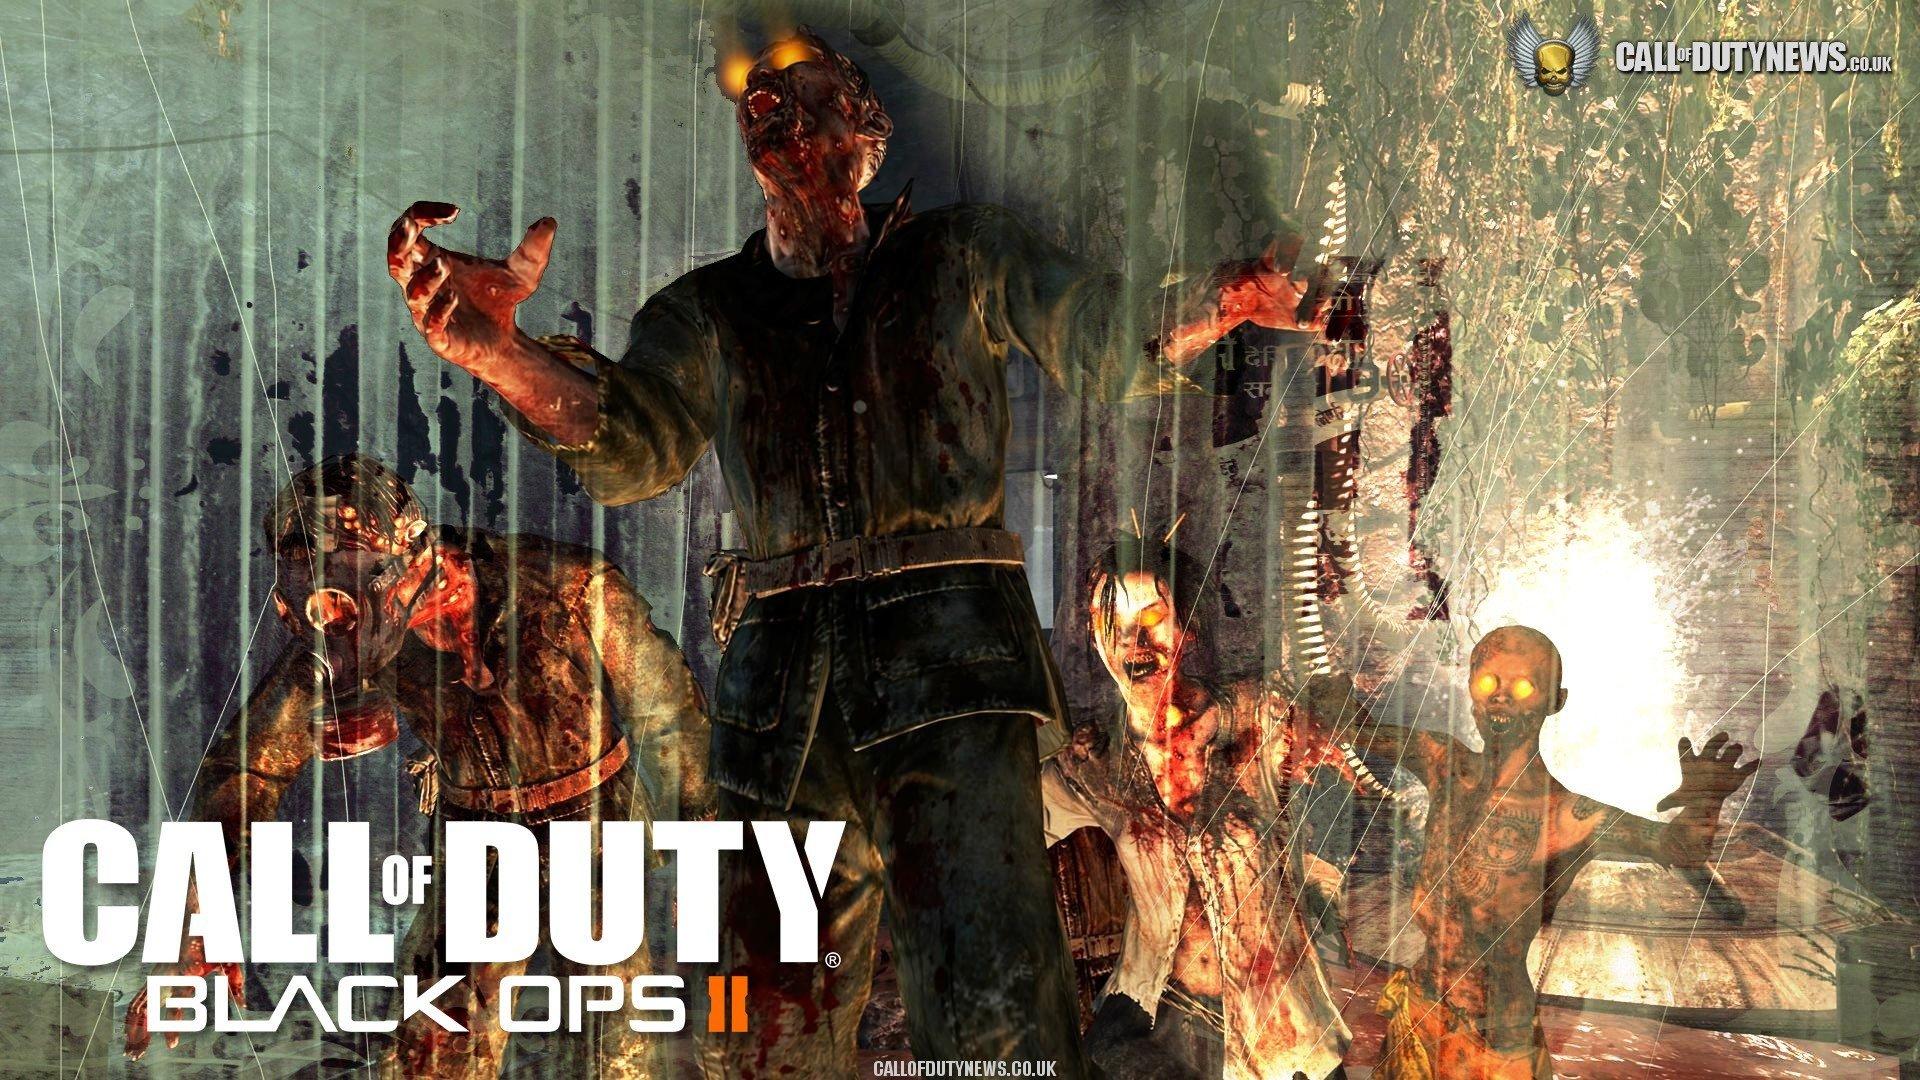 Download Full Hd 1920x1080 Call Of Duty Black Ops 2 Desktop